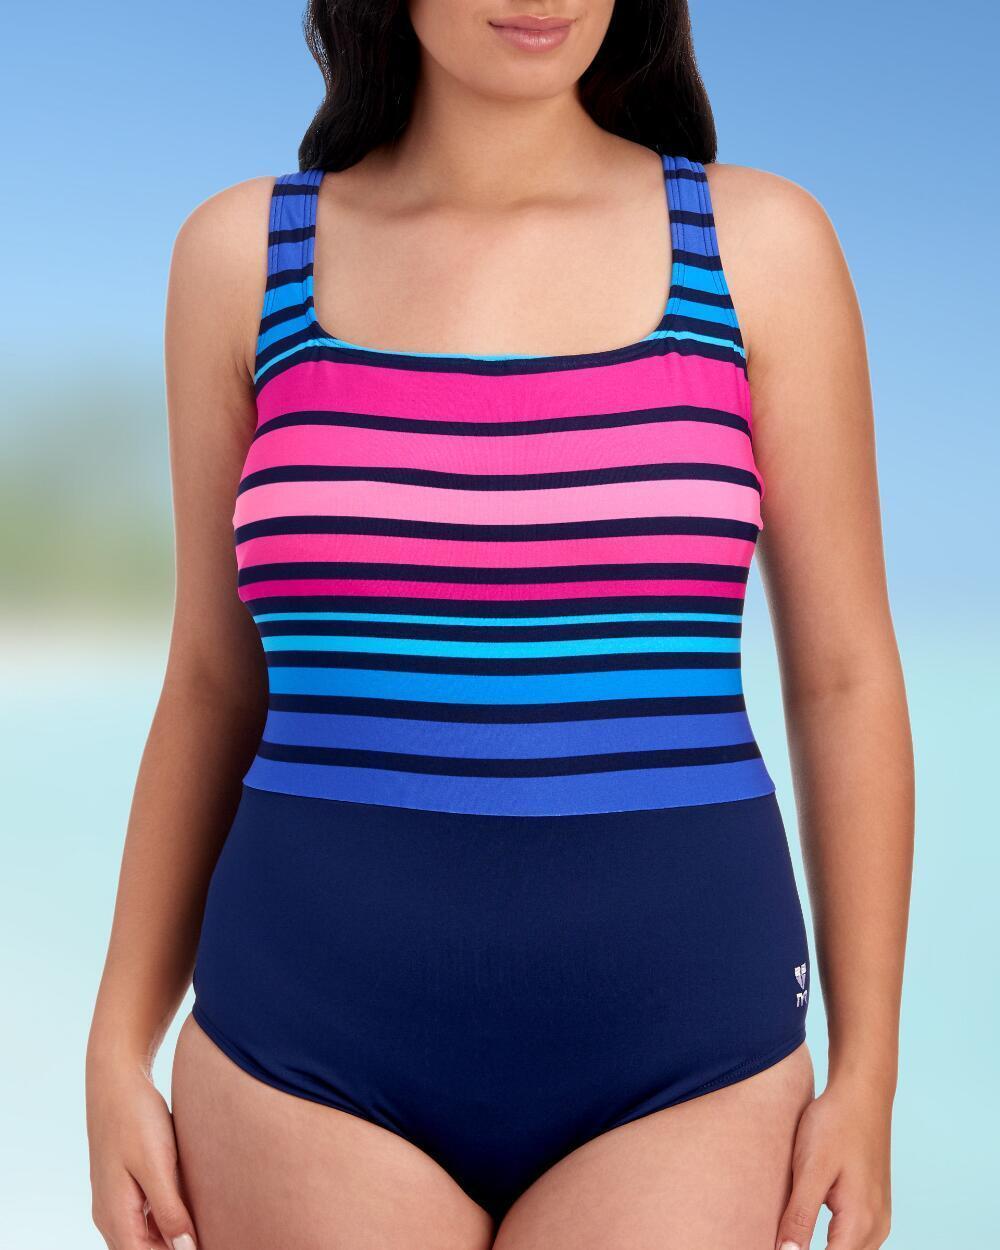 NEW TYR Women's Ombre Stripe Aqua Controlfit Navy Pink Plus Size 24